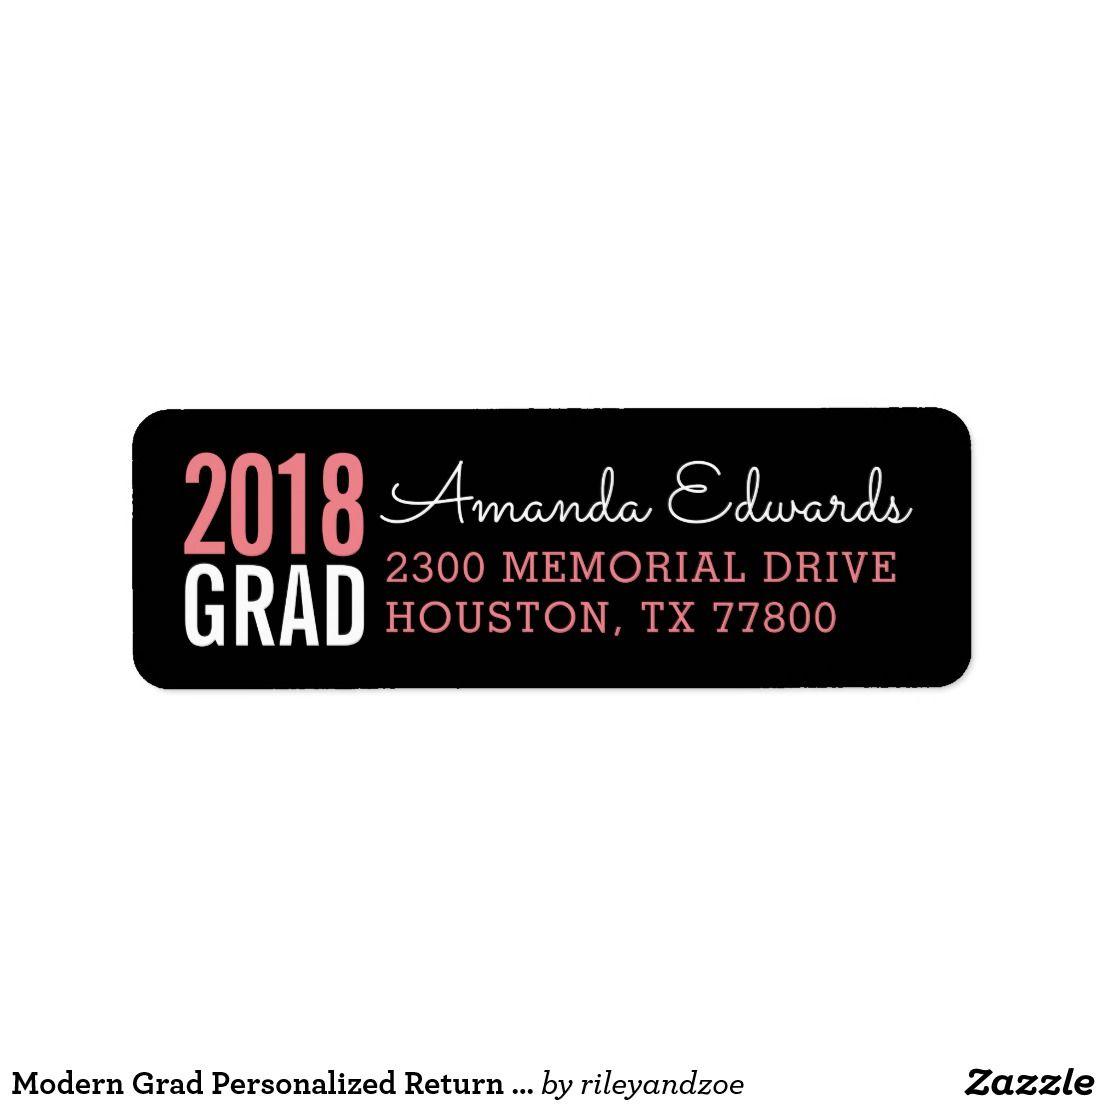 modern grad personalized return address label personalized return